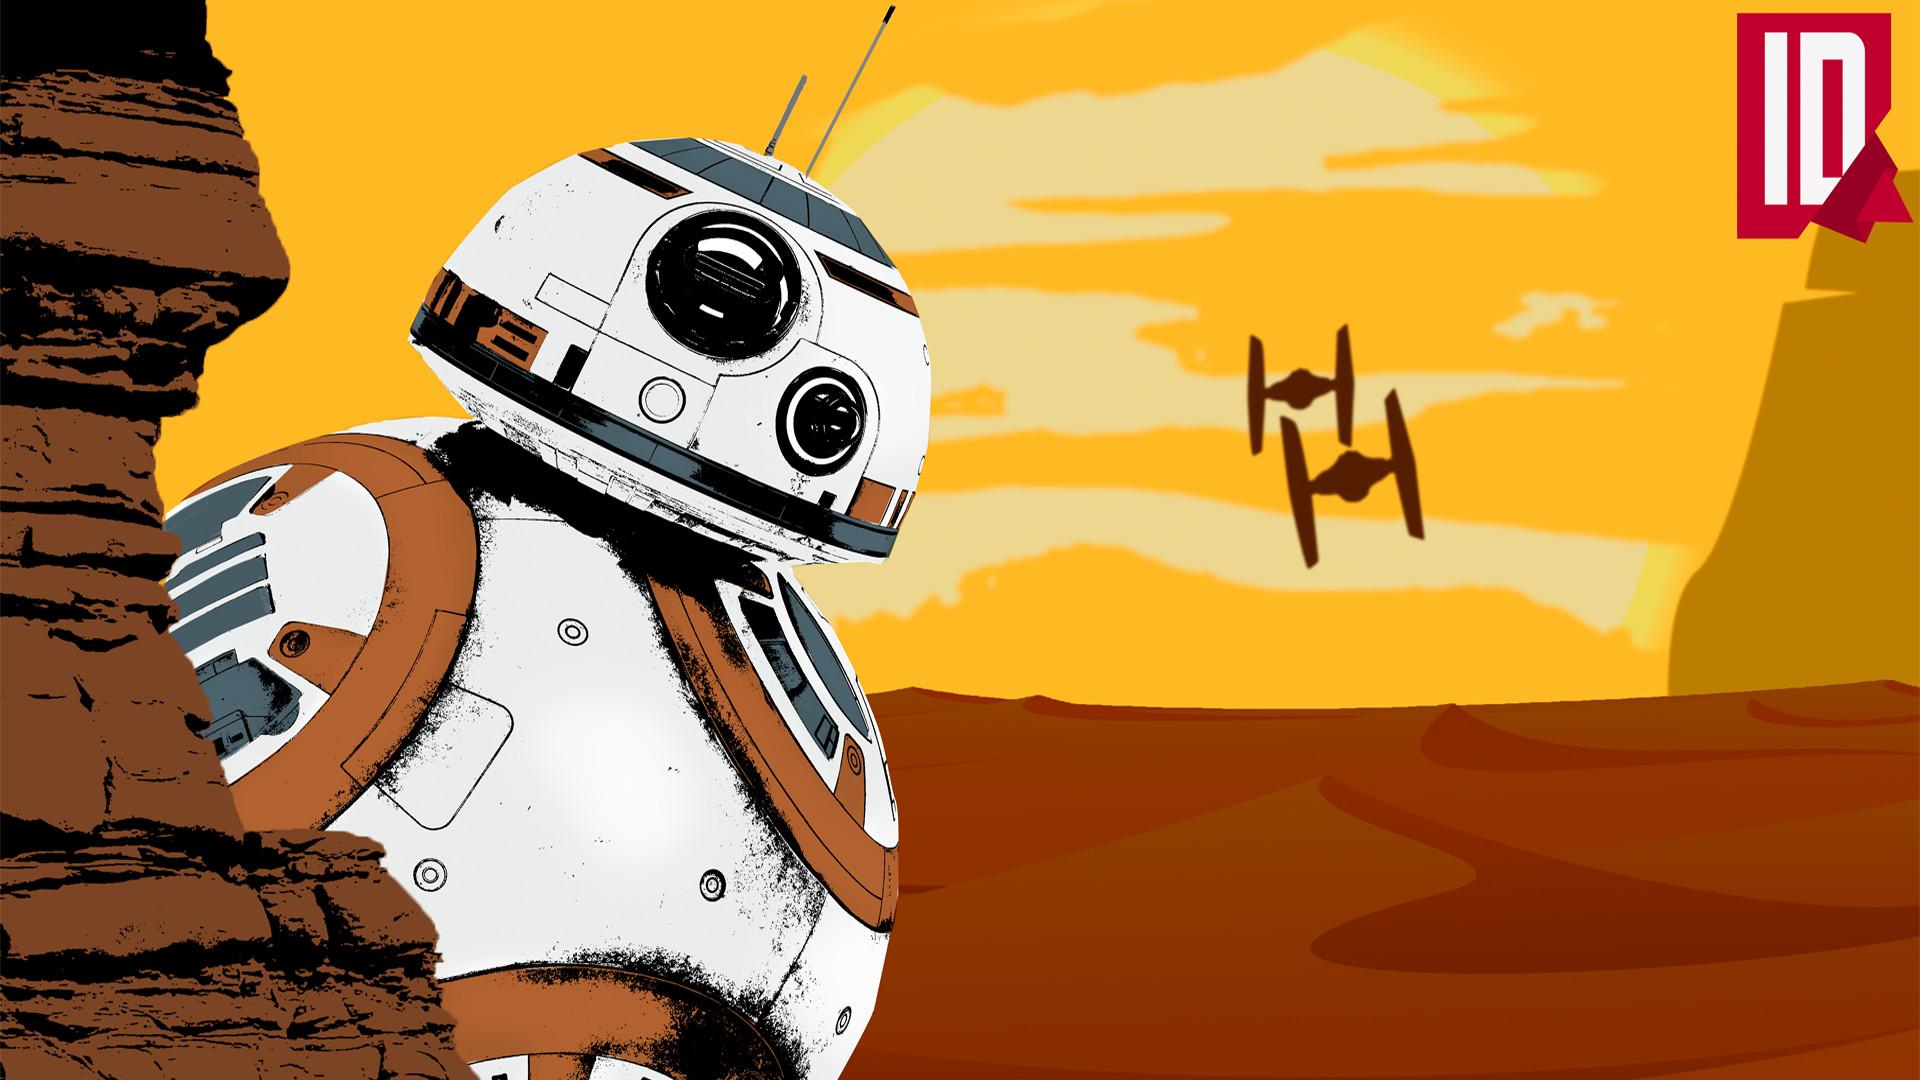 … IndividualDesign Star Wars BB-8 – Wallpaper by IndividualDesign